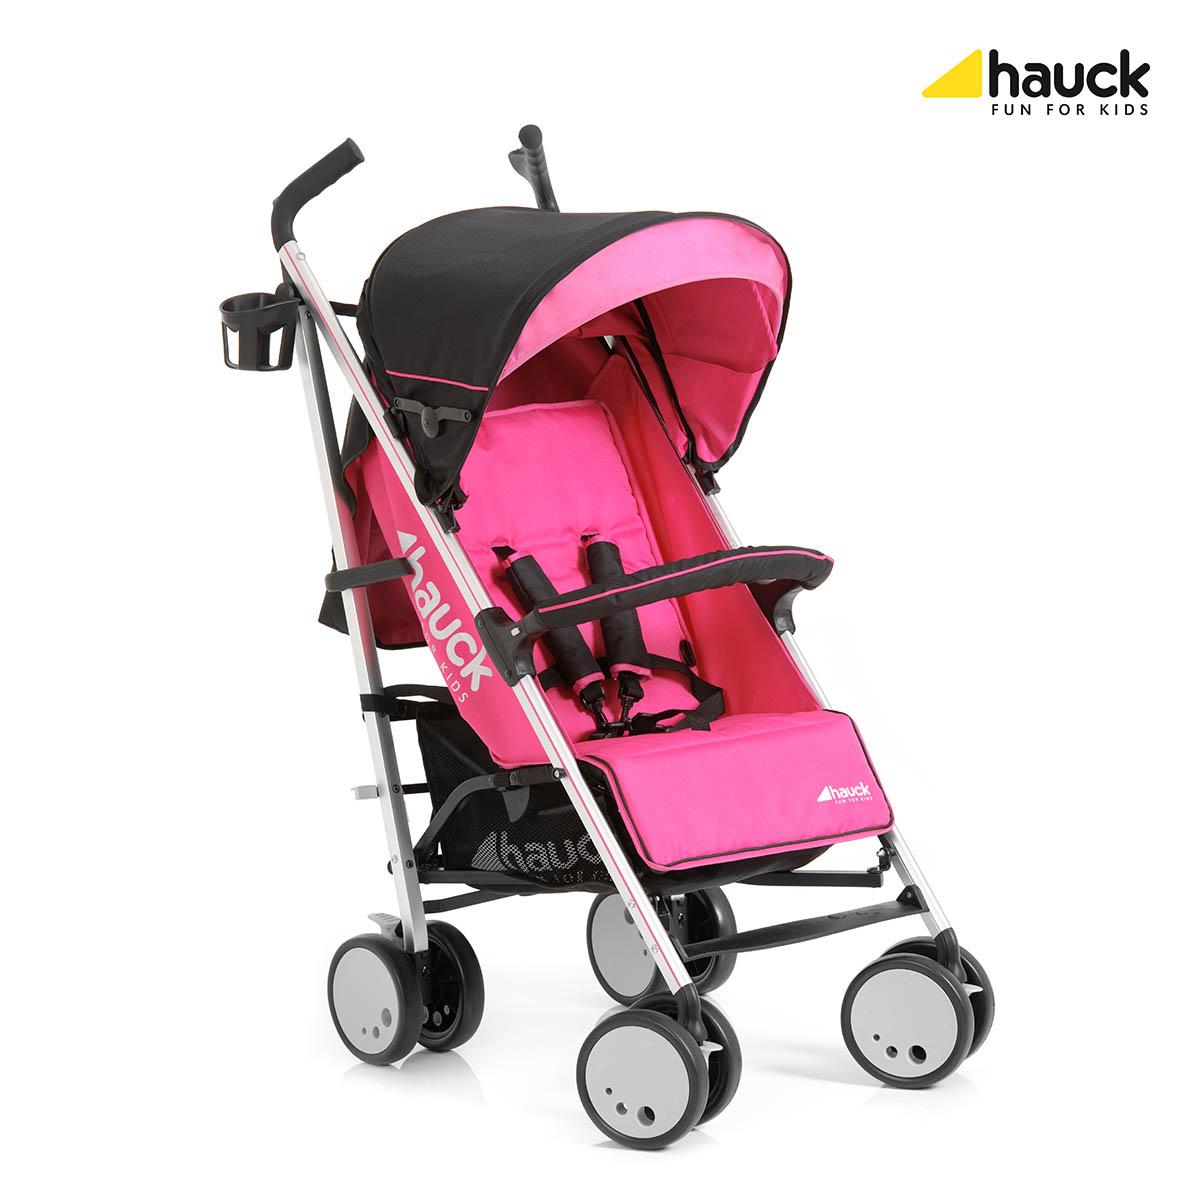 hauck buggy torro buy at kidsroom strollers. Black Bedroom Furniture Sets. Home Design Ideas